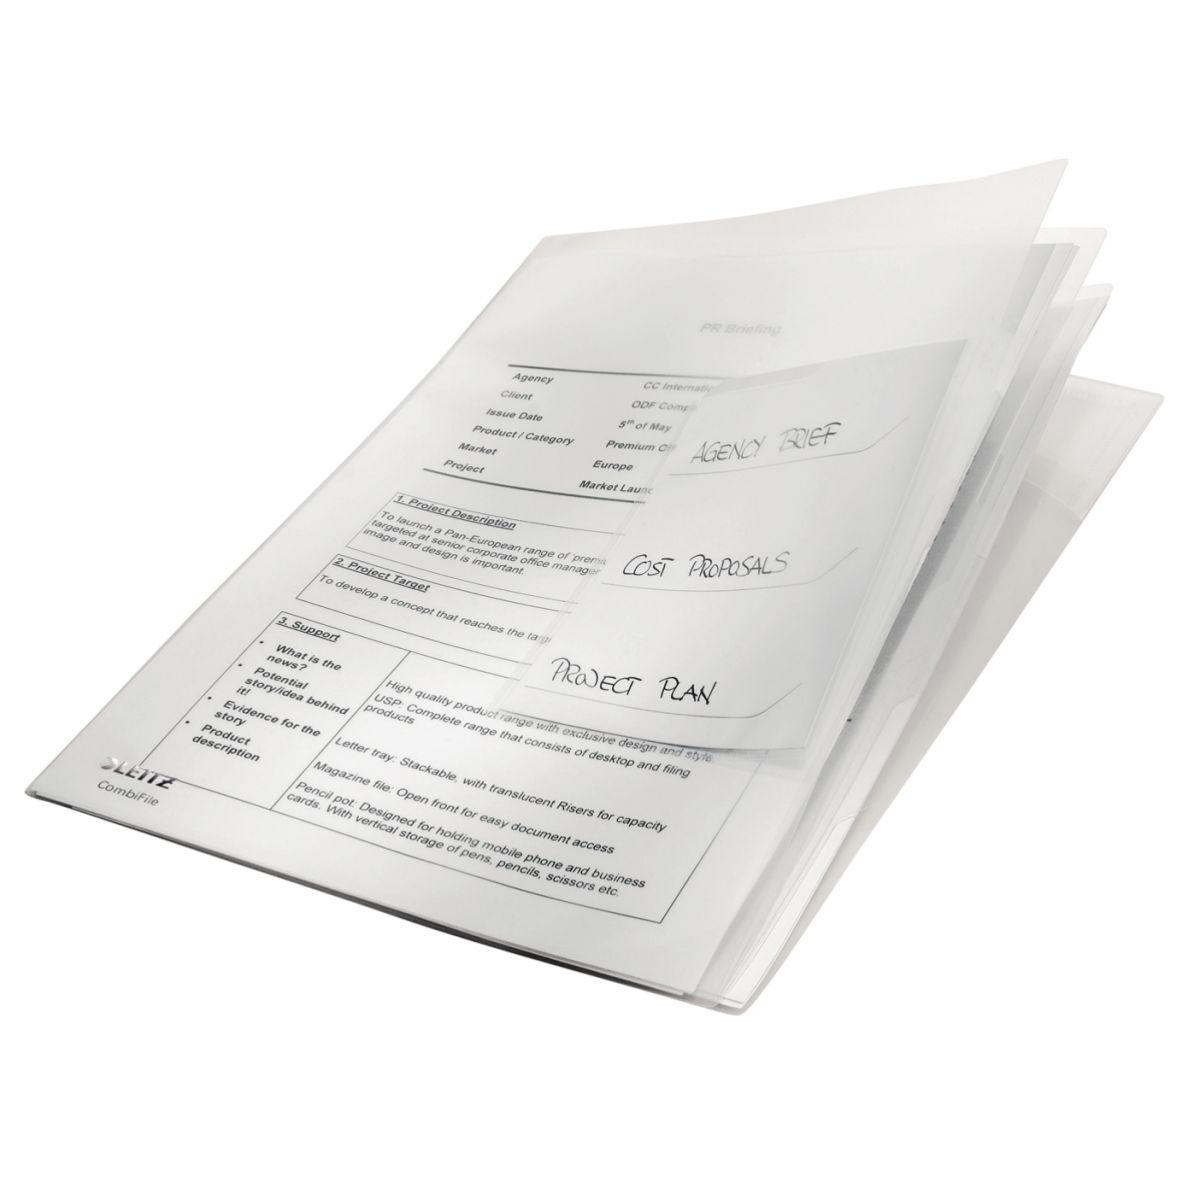 Pasta Organizadora CombiFile Esselte - Capacidade: 3 x 20 fls (3 unidades), Cor: Clear (Branco), Cod: 63484